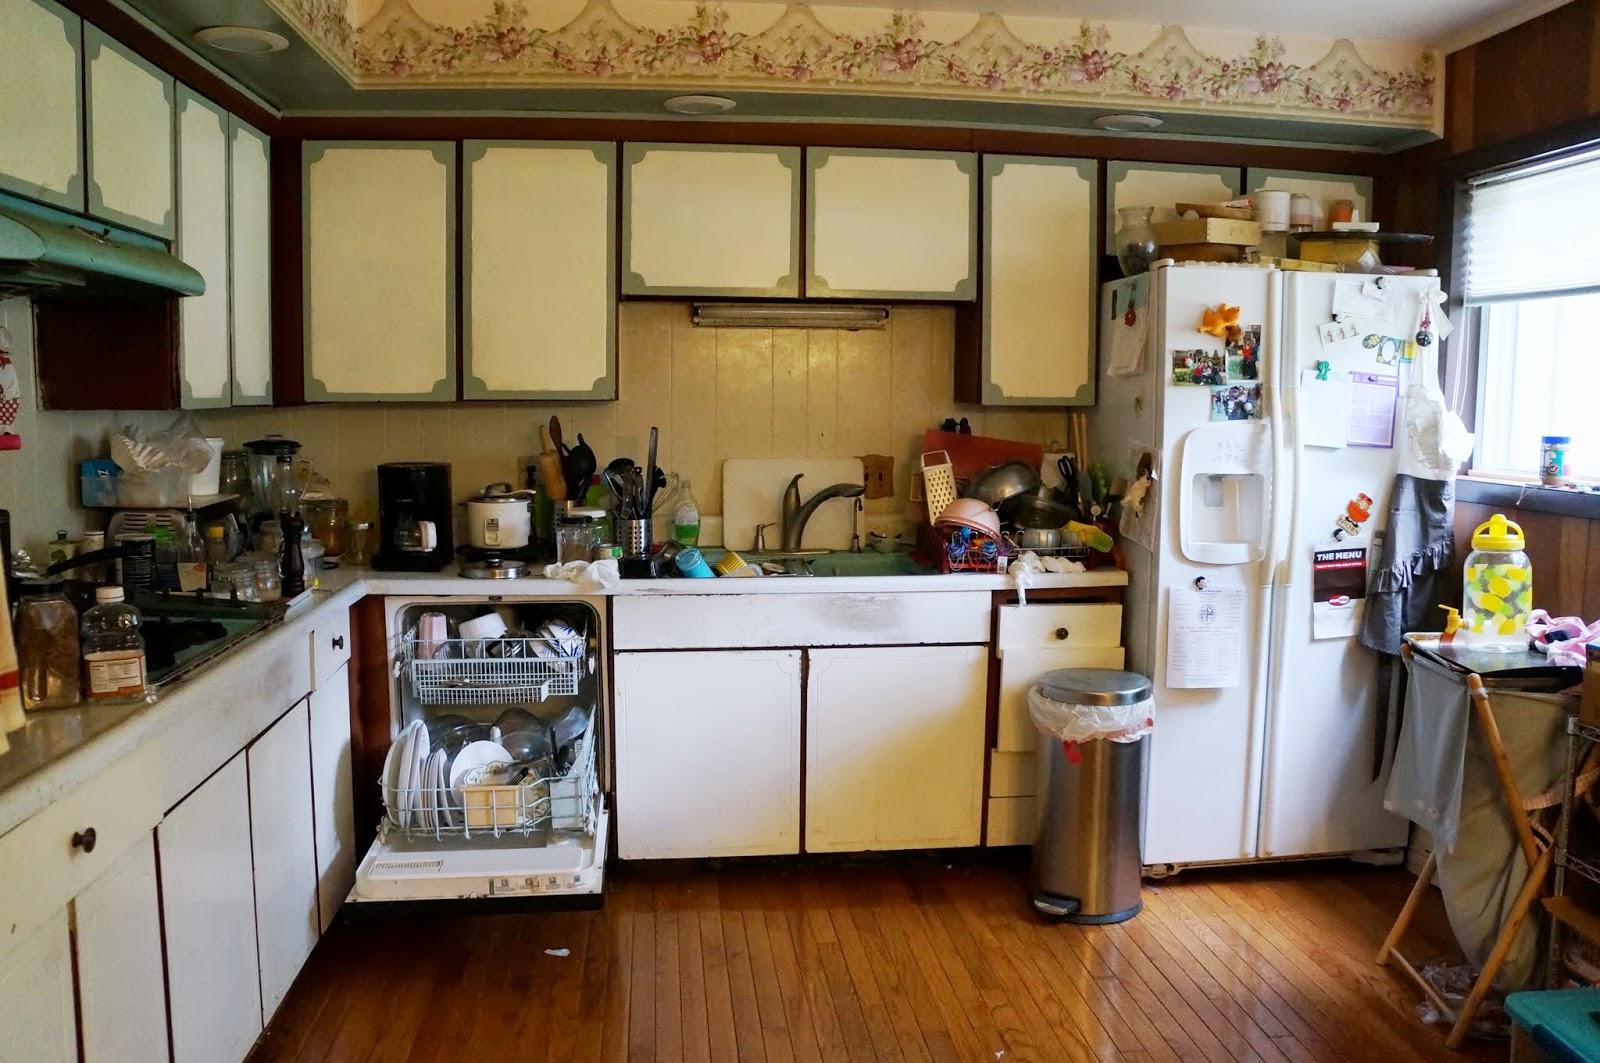 Enchanting Myers Kitchen Appliances Image - Interior Design Ideas ...